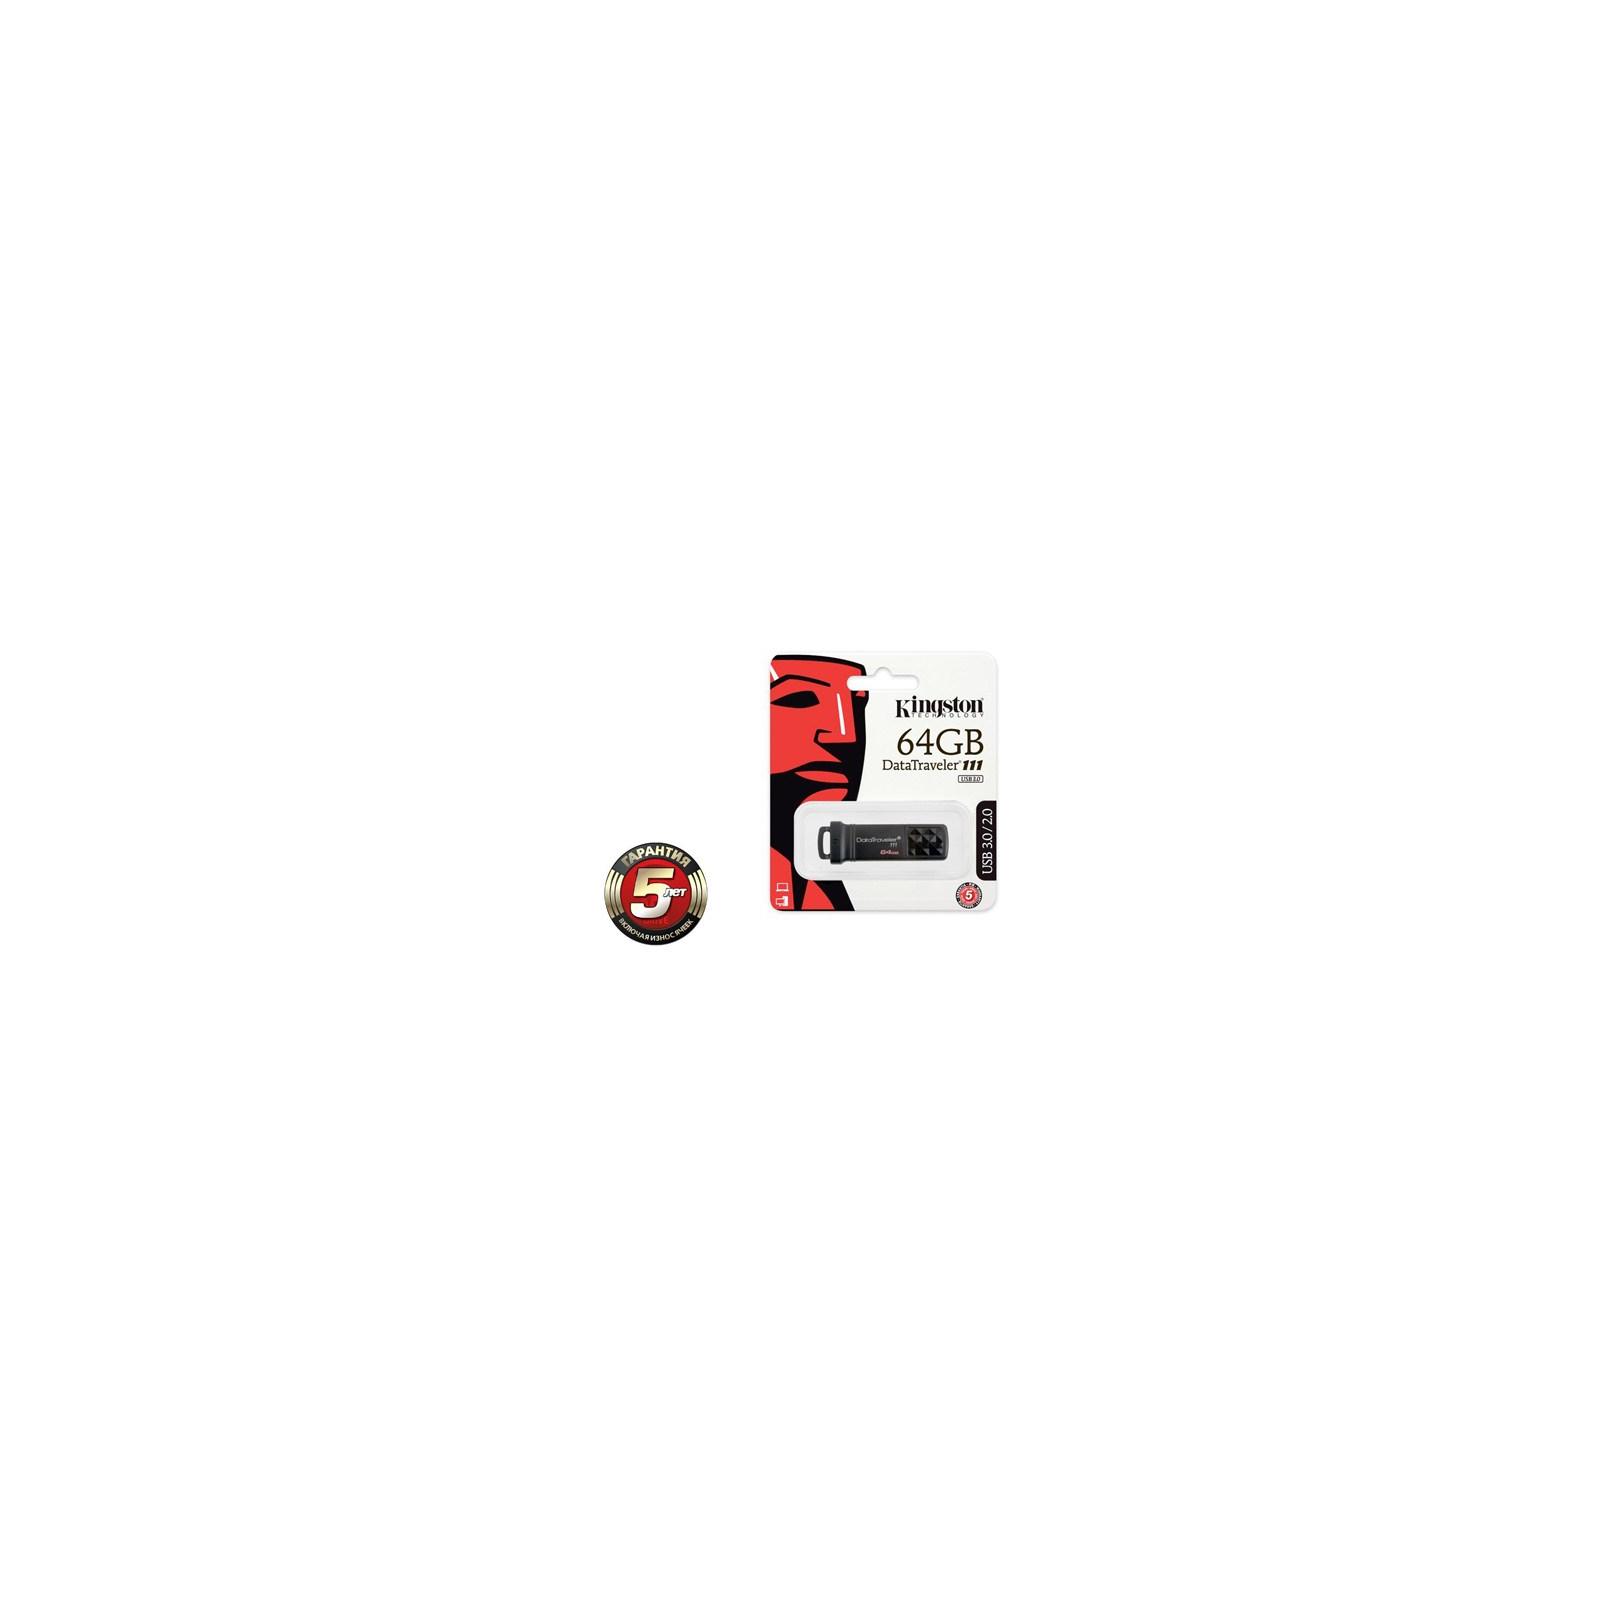 USB флеш накопитель Kingston 64Gb DataTraveler DT111 Black (DT111/64GB) изображение 3